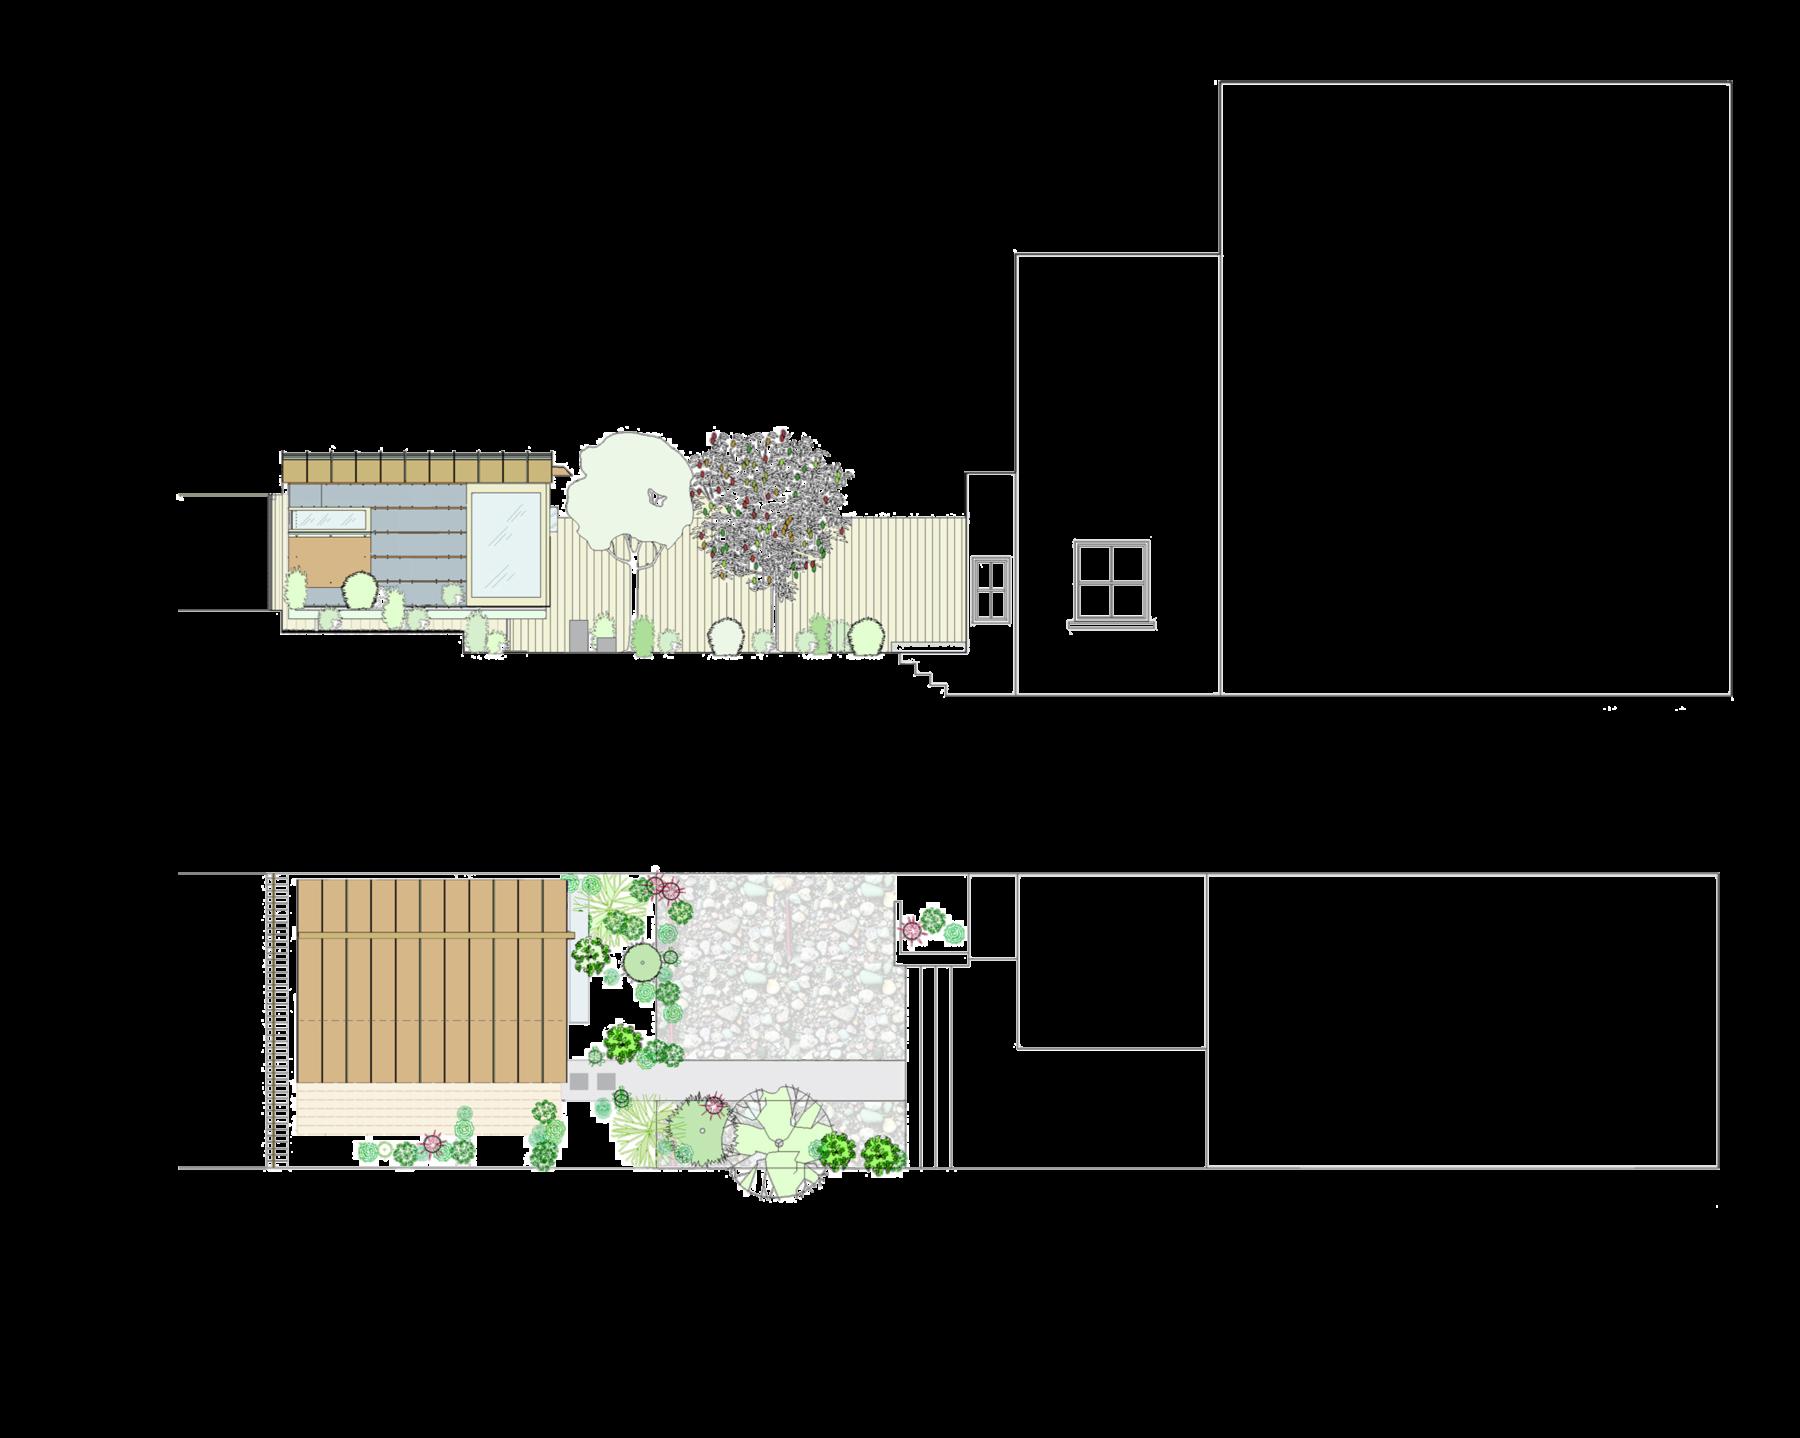 Sarah-Wigglesworth-Architects Garden Studio drawing 3600